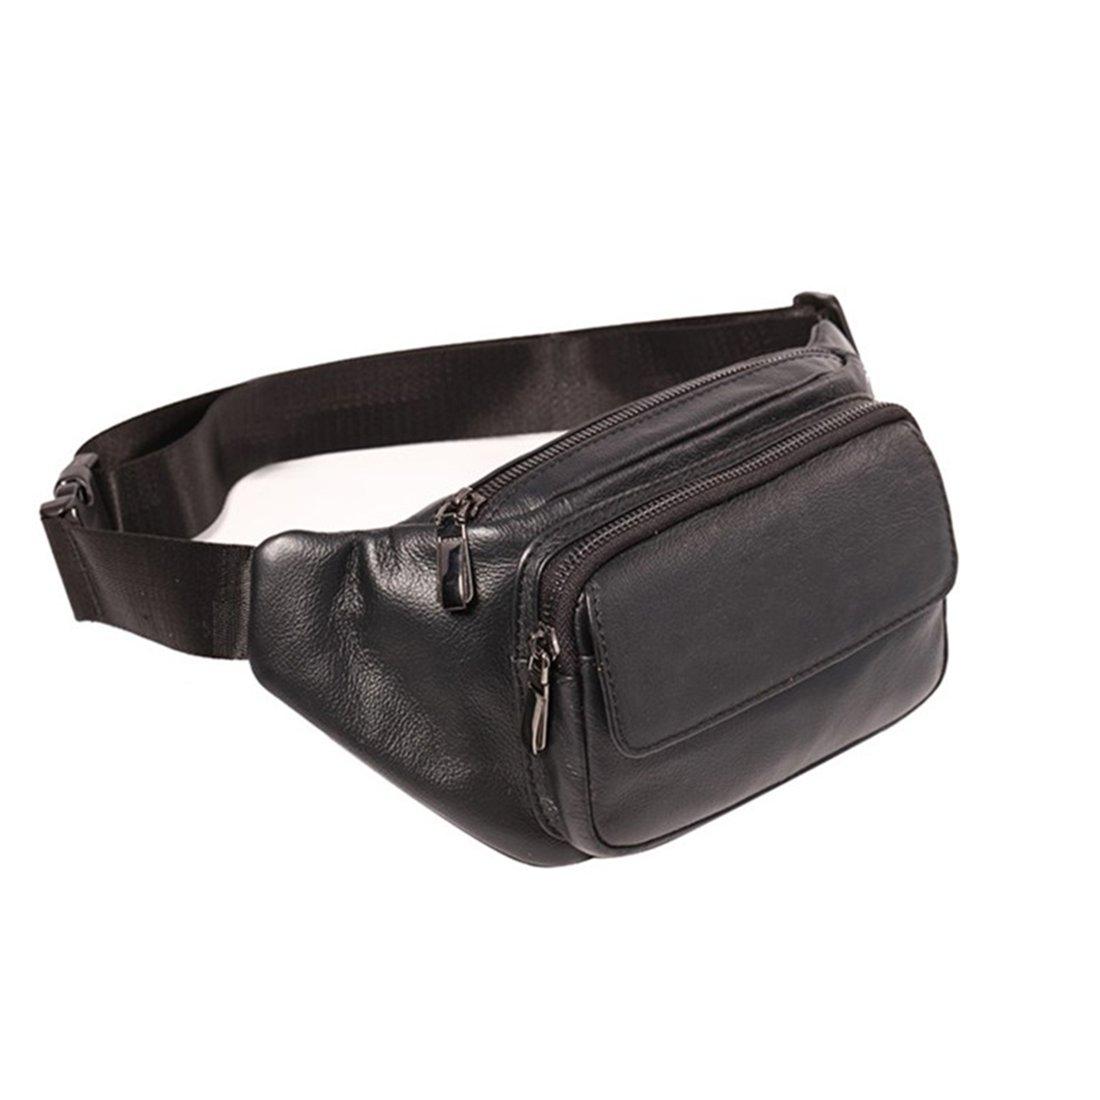 AIAIMEI Leder Bauchtasche Vintage Gürteltasche Leder Bauchtasche Hüfttasche Kamera Handy Reise Festival Unisex Echtleder Mode-Hüfttaschen